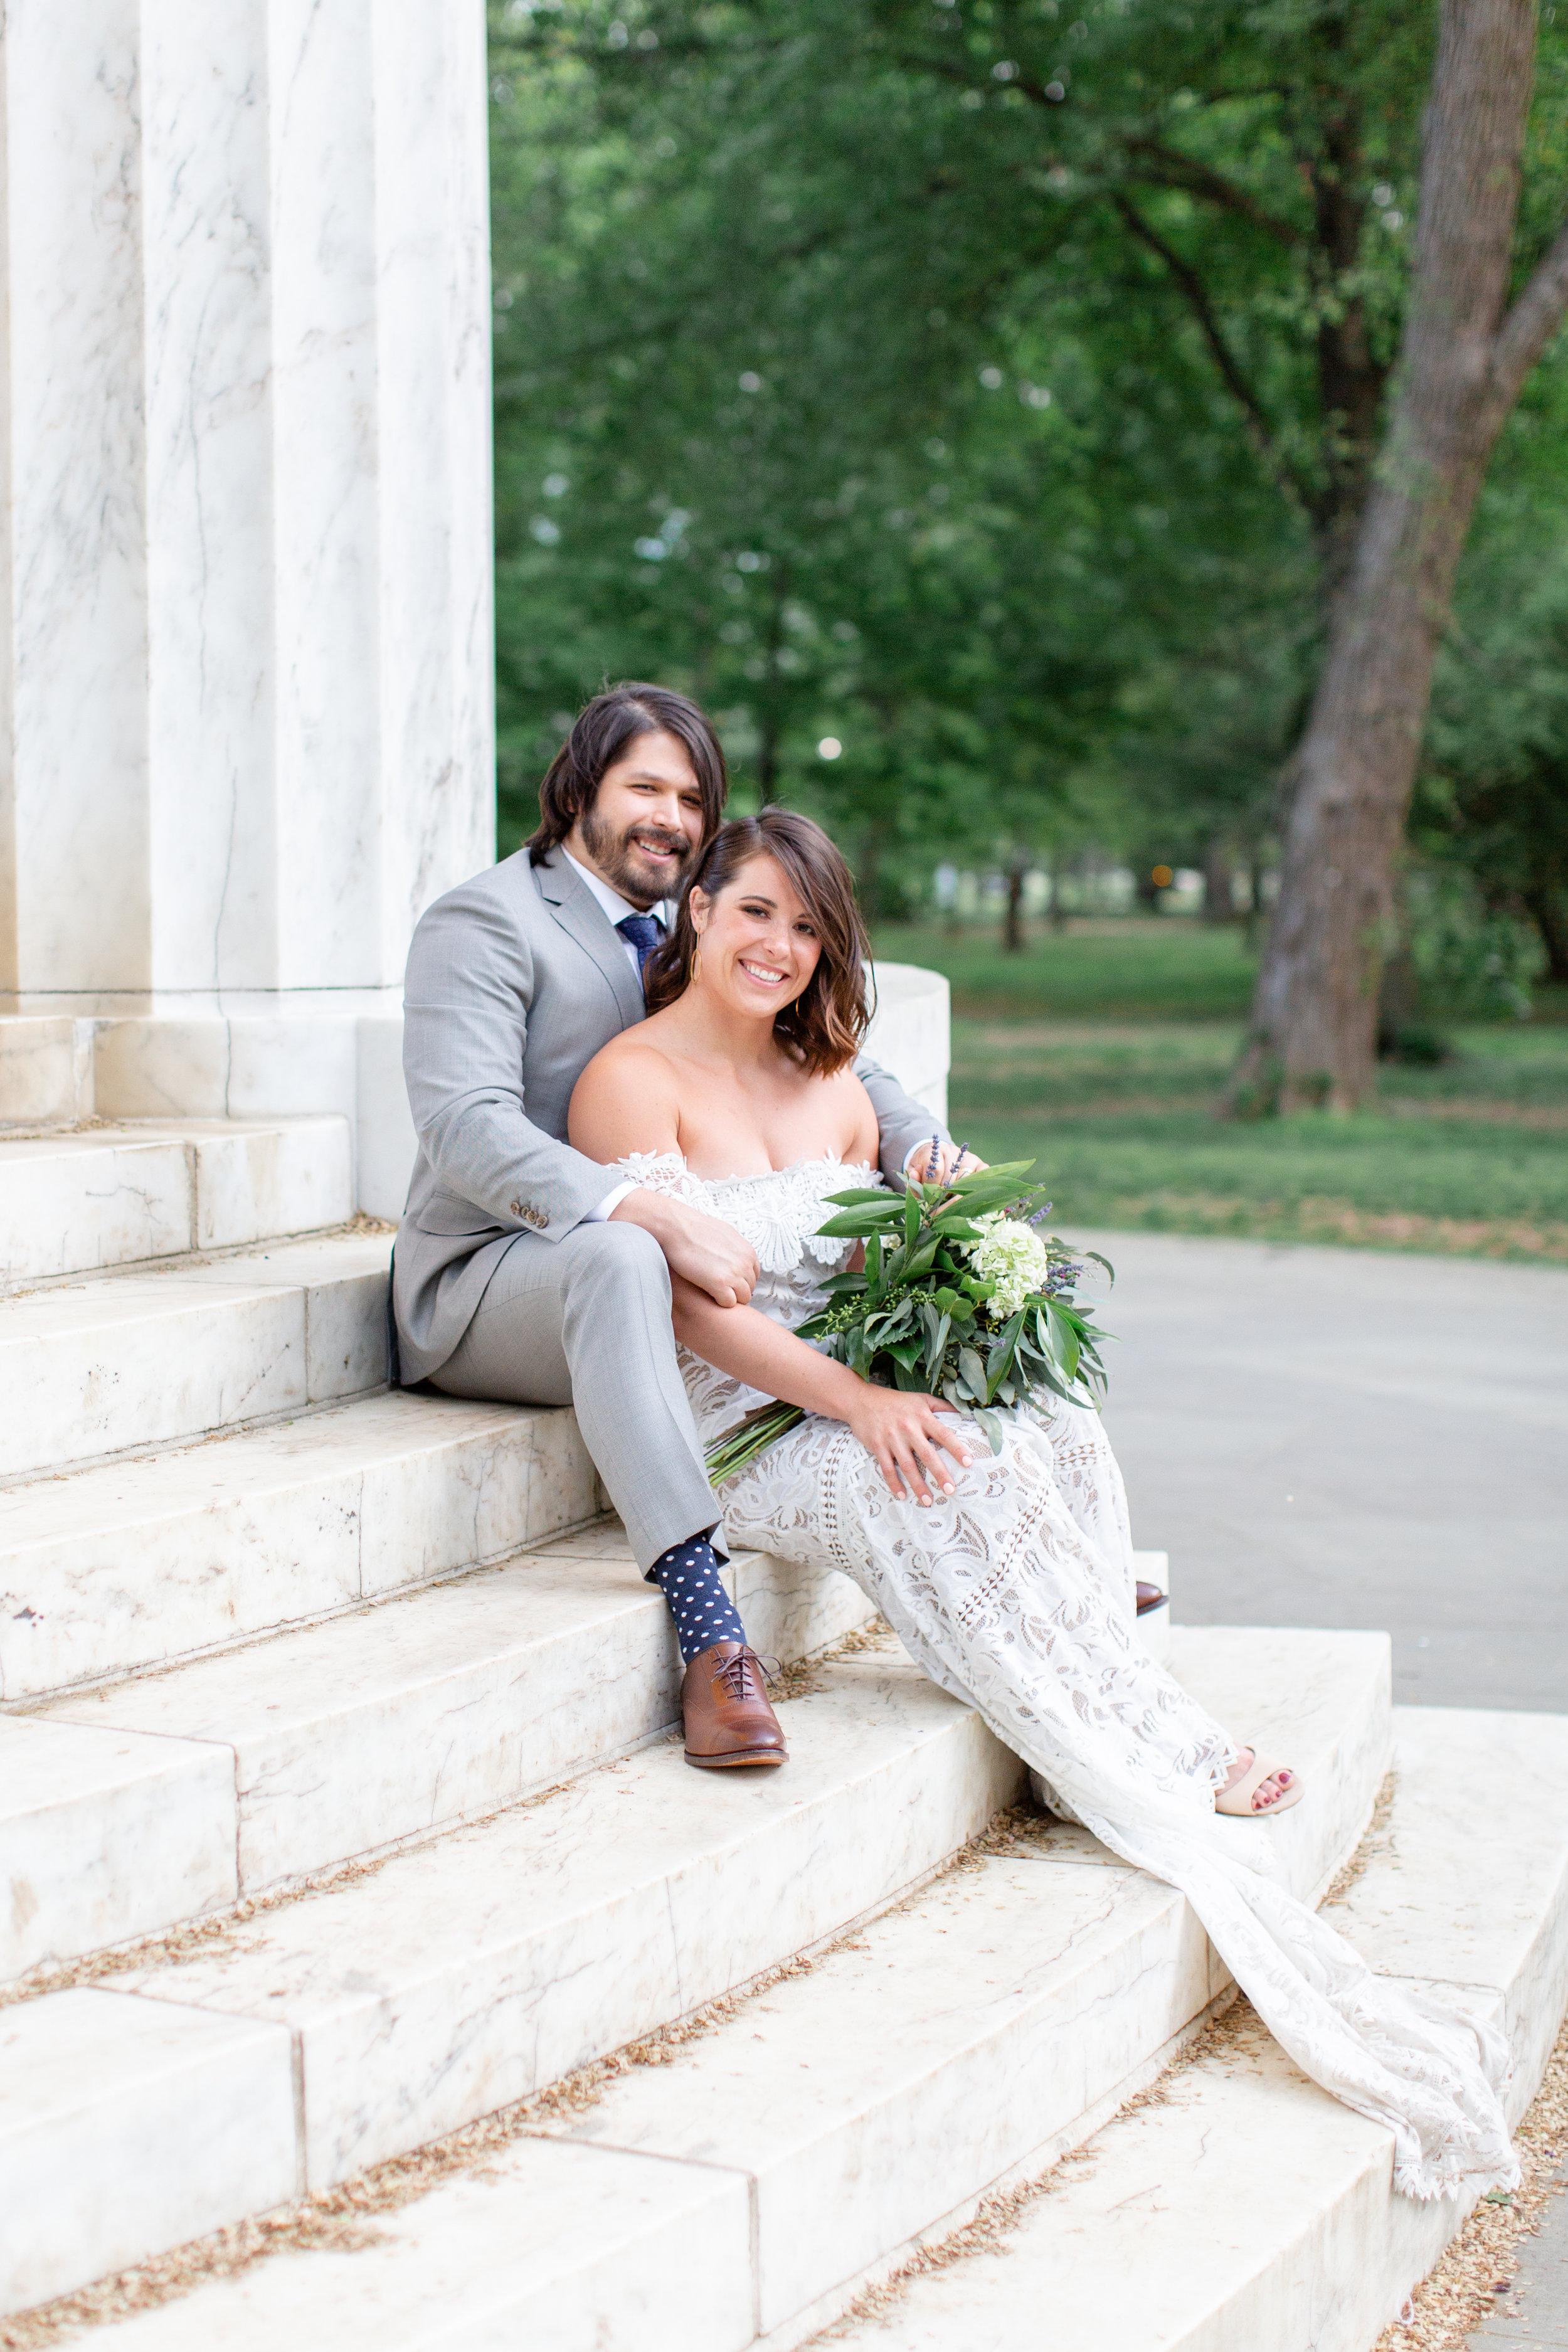 kate-george-washington-dc-wedding-emily-belson-photography_064.jpg